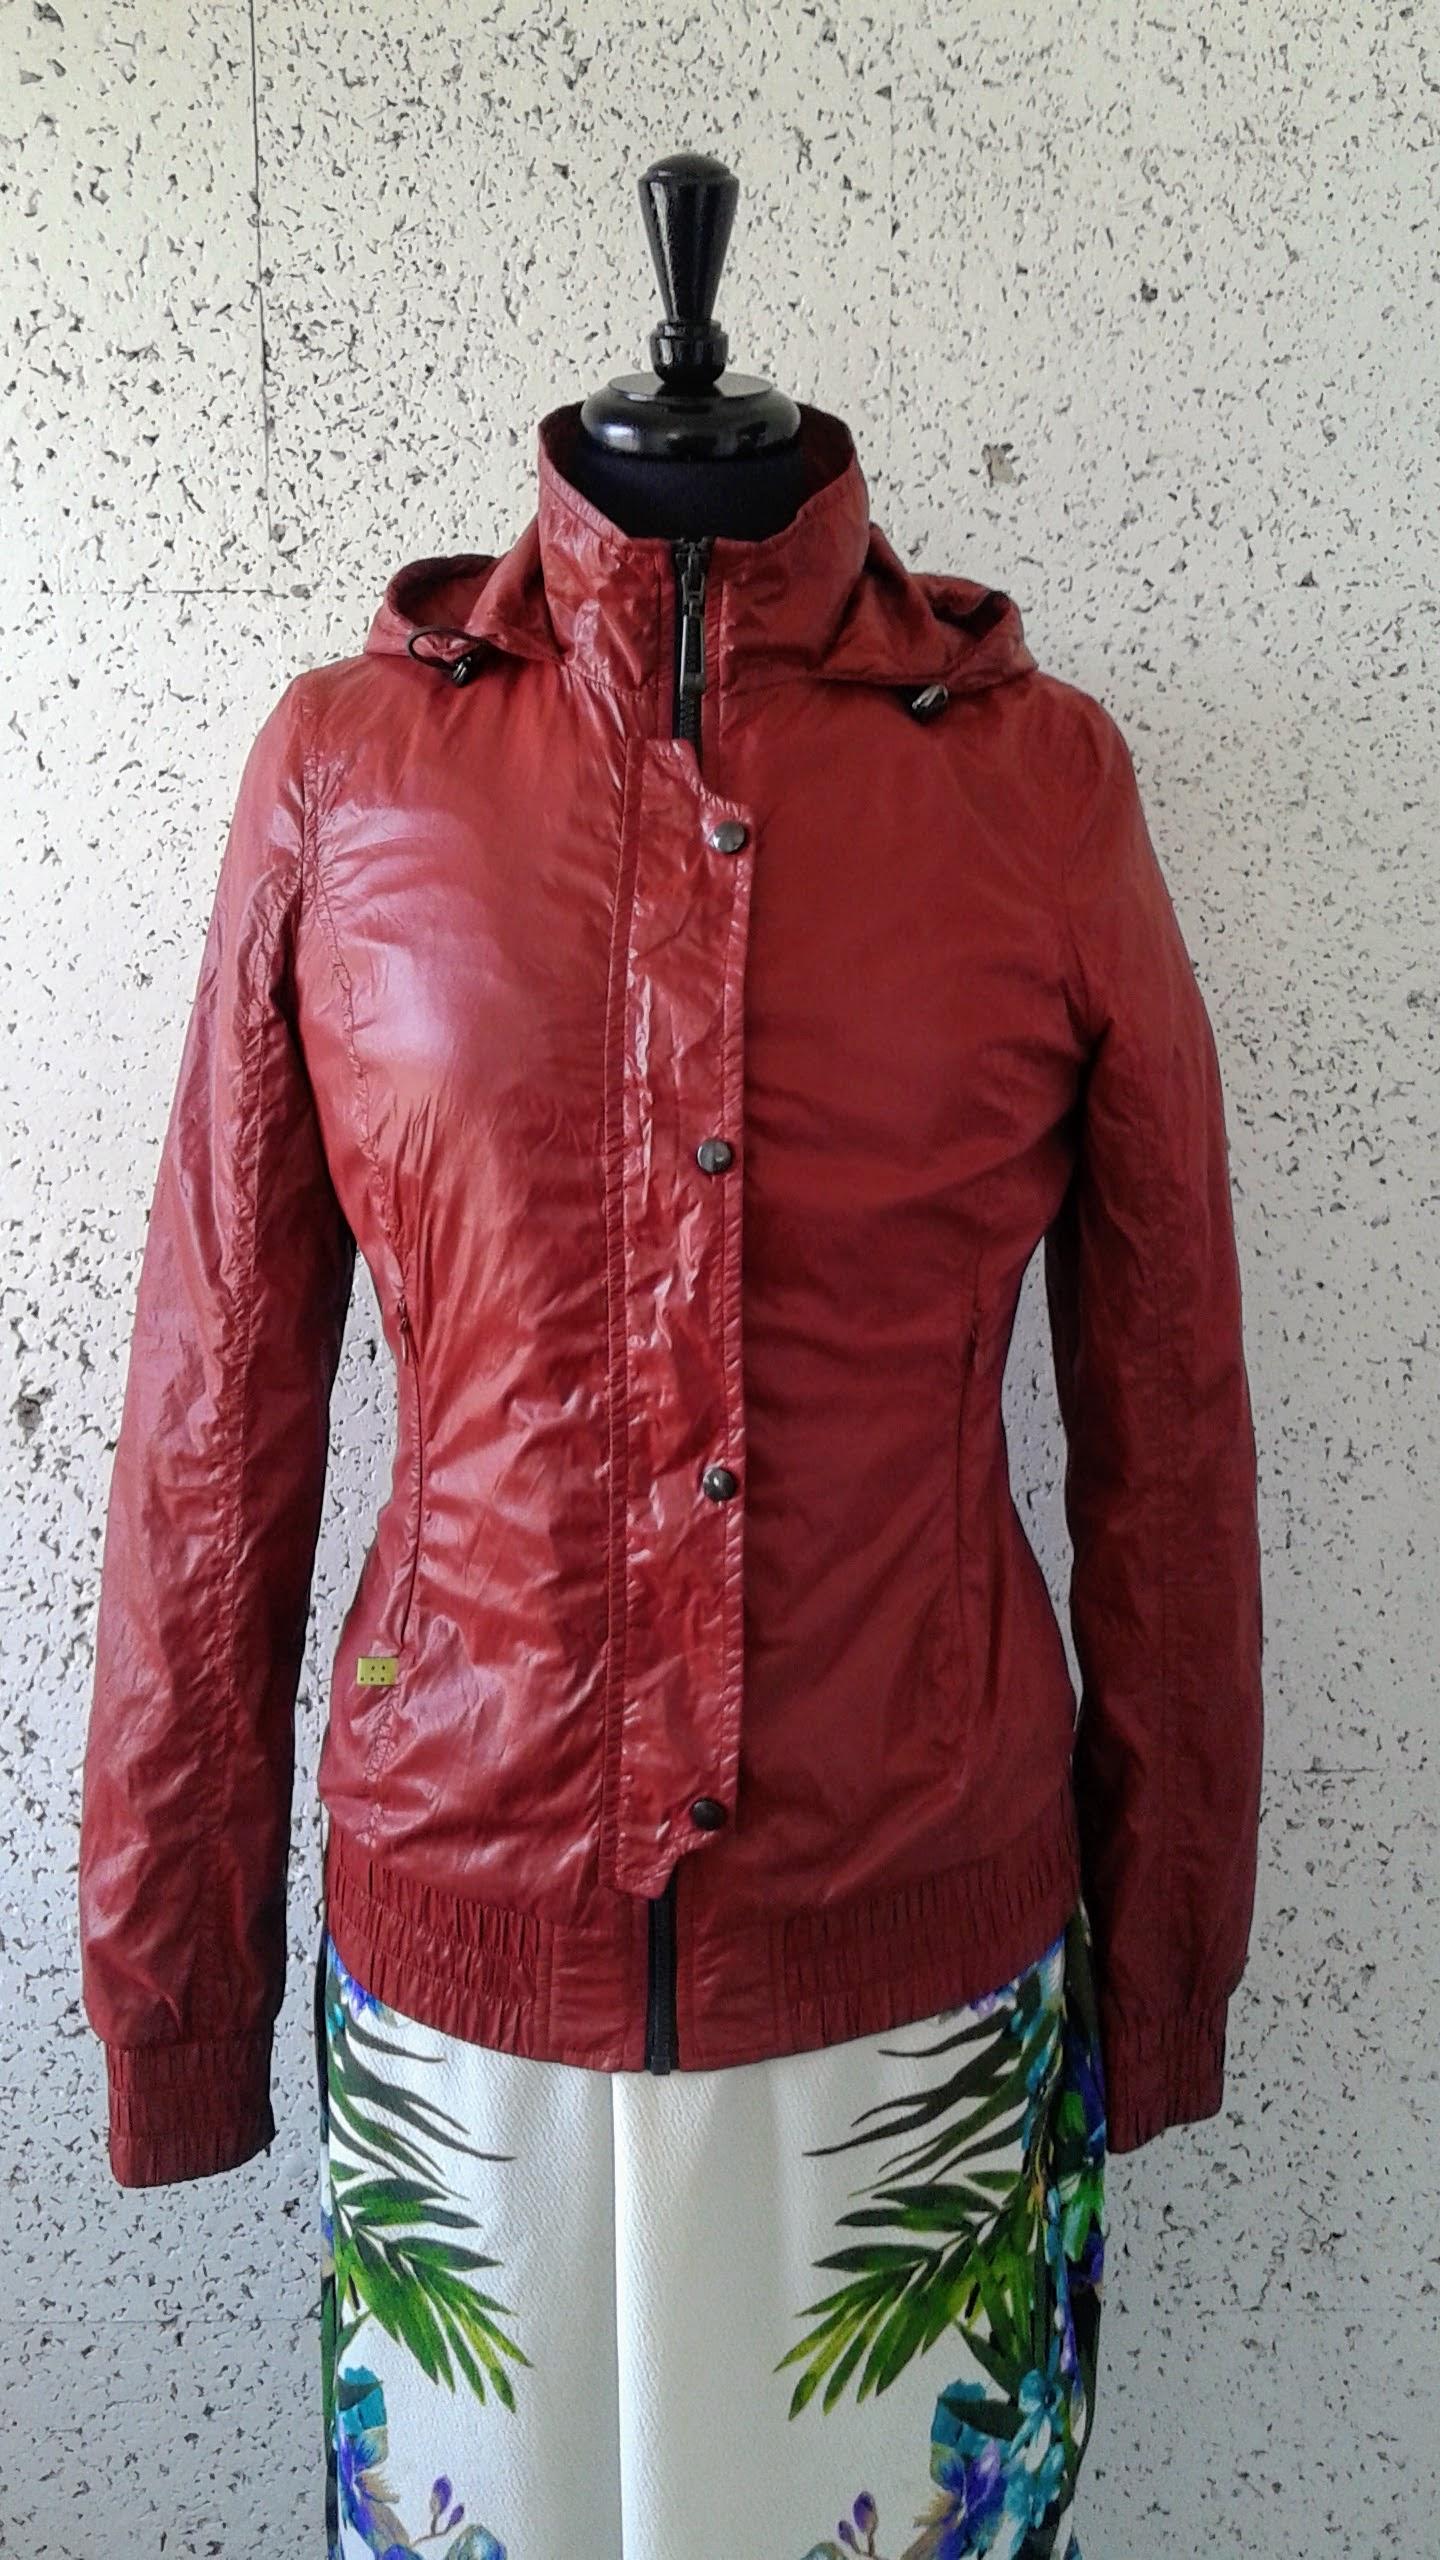 Soia & Kyo jacket; Size S, $40